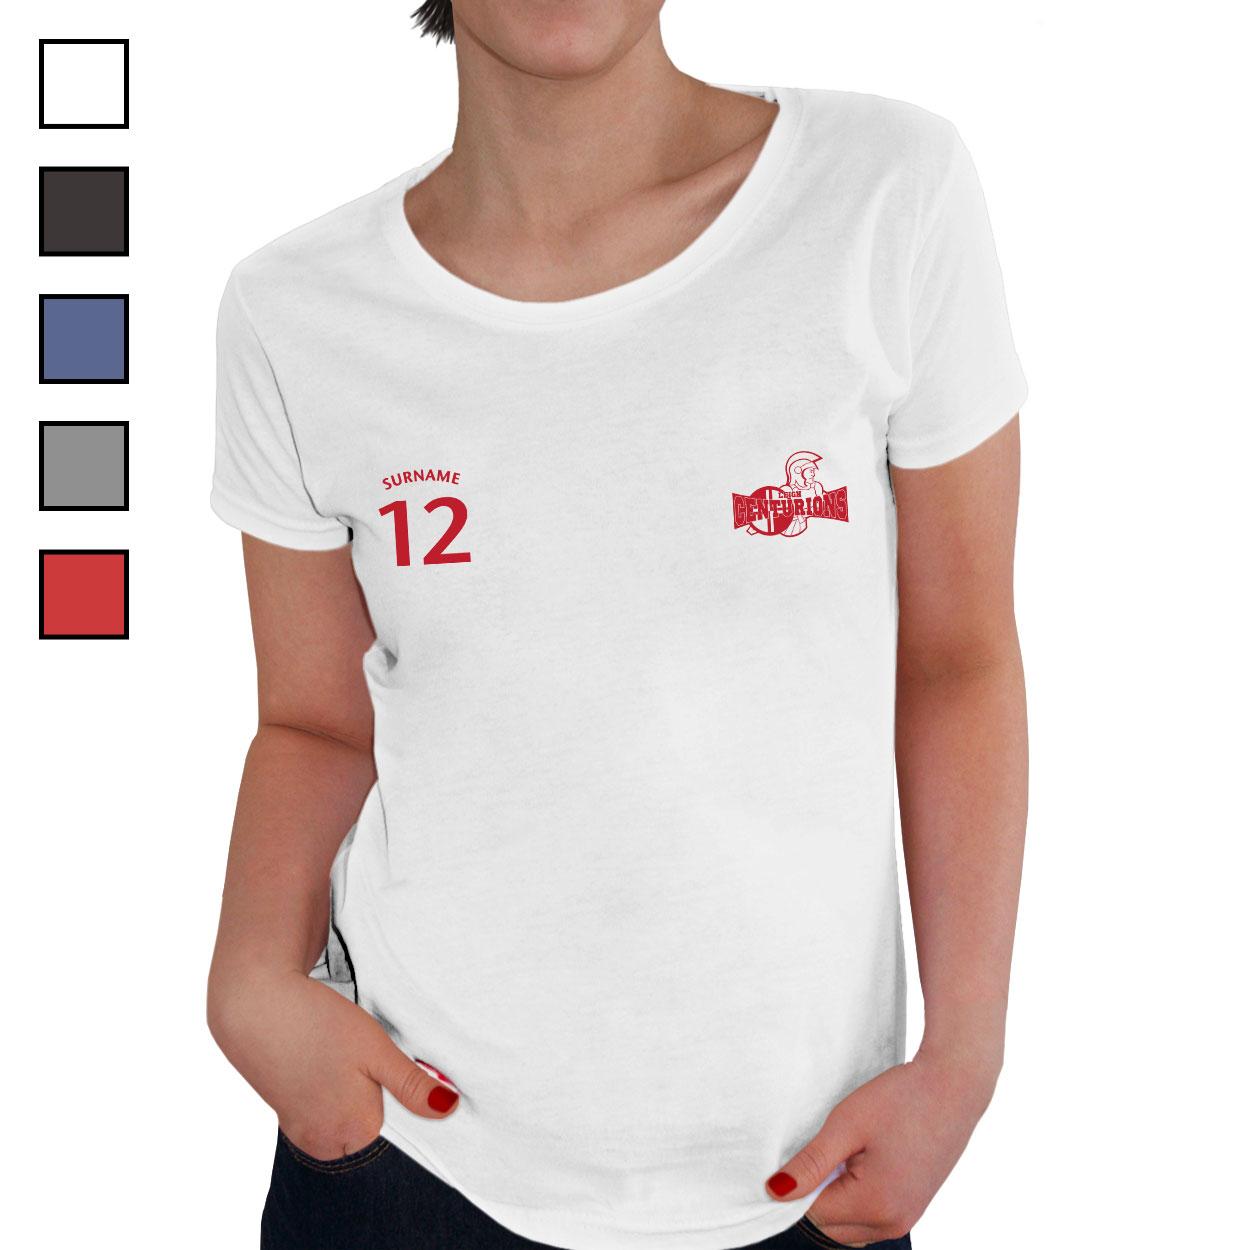 Leigh Centurions Ladies Sports T-Shirt